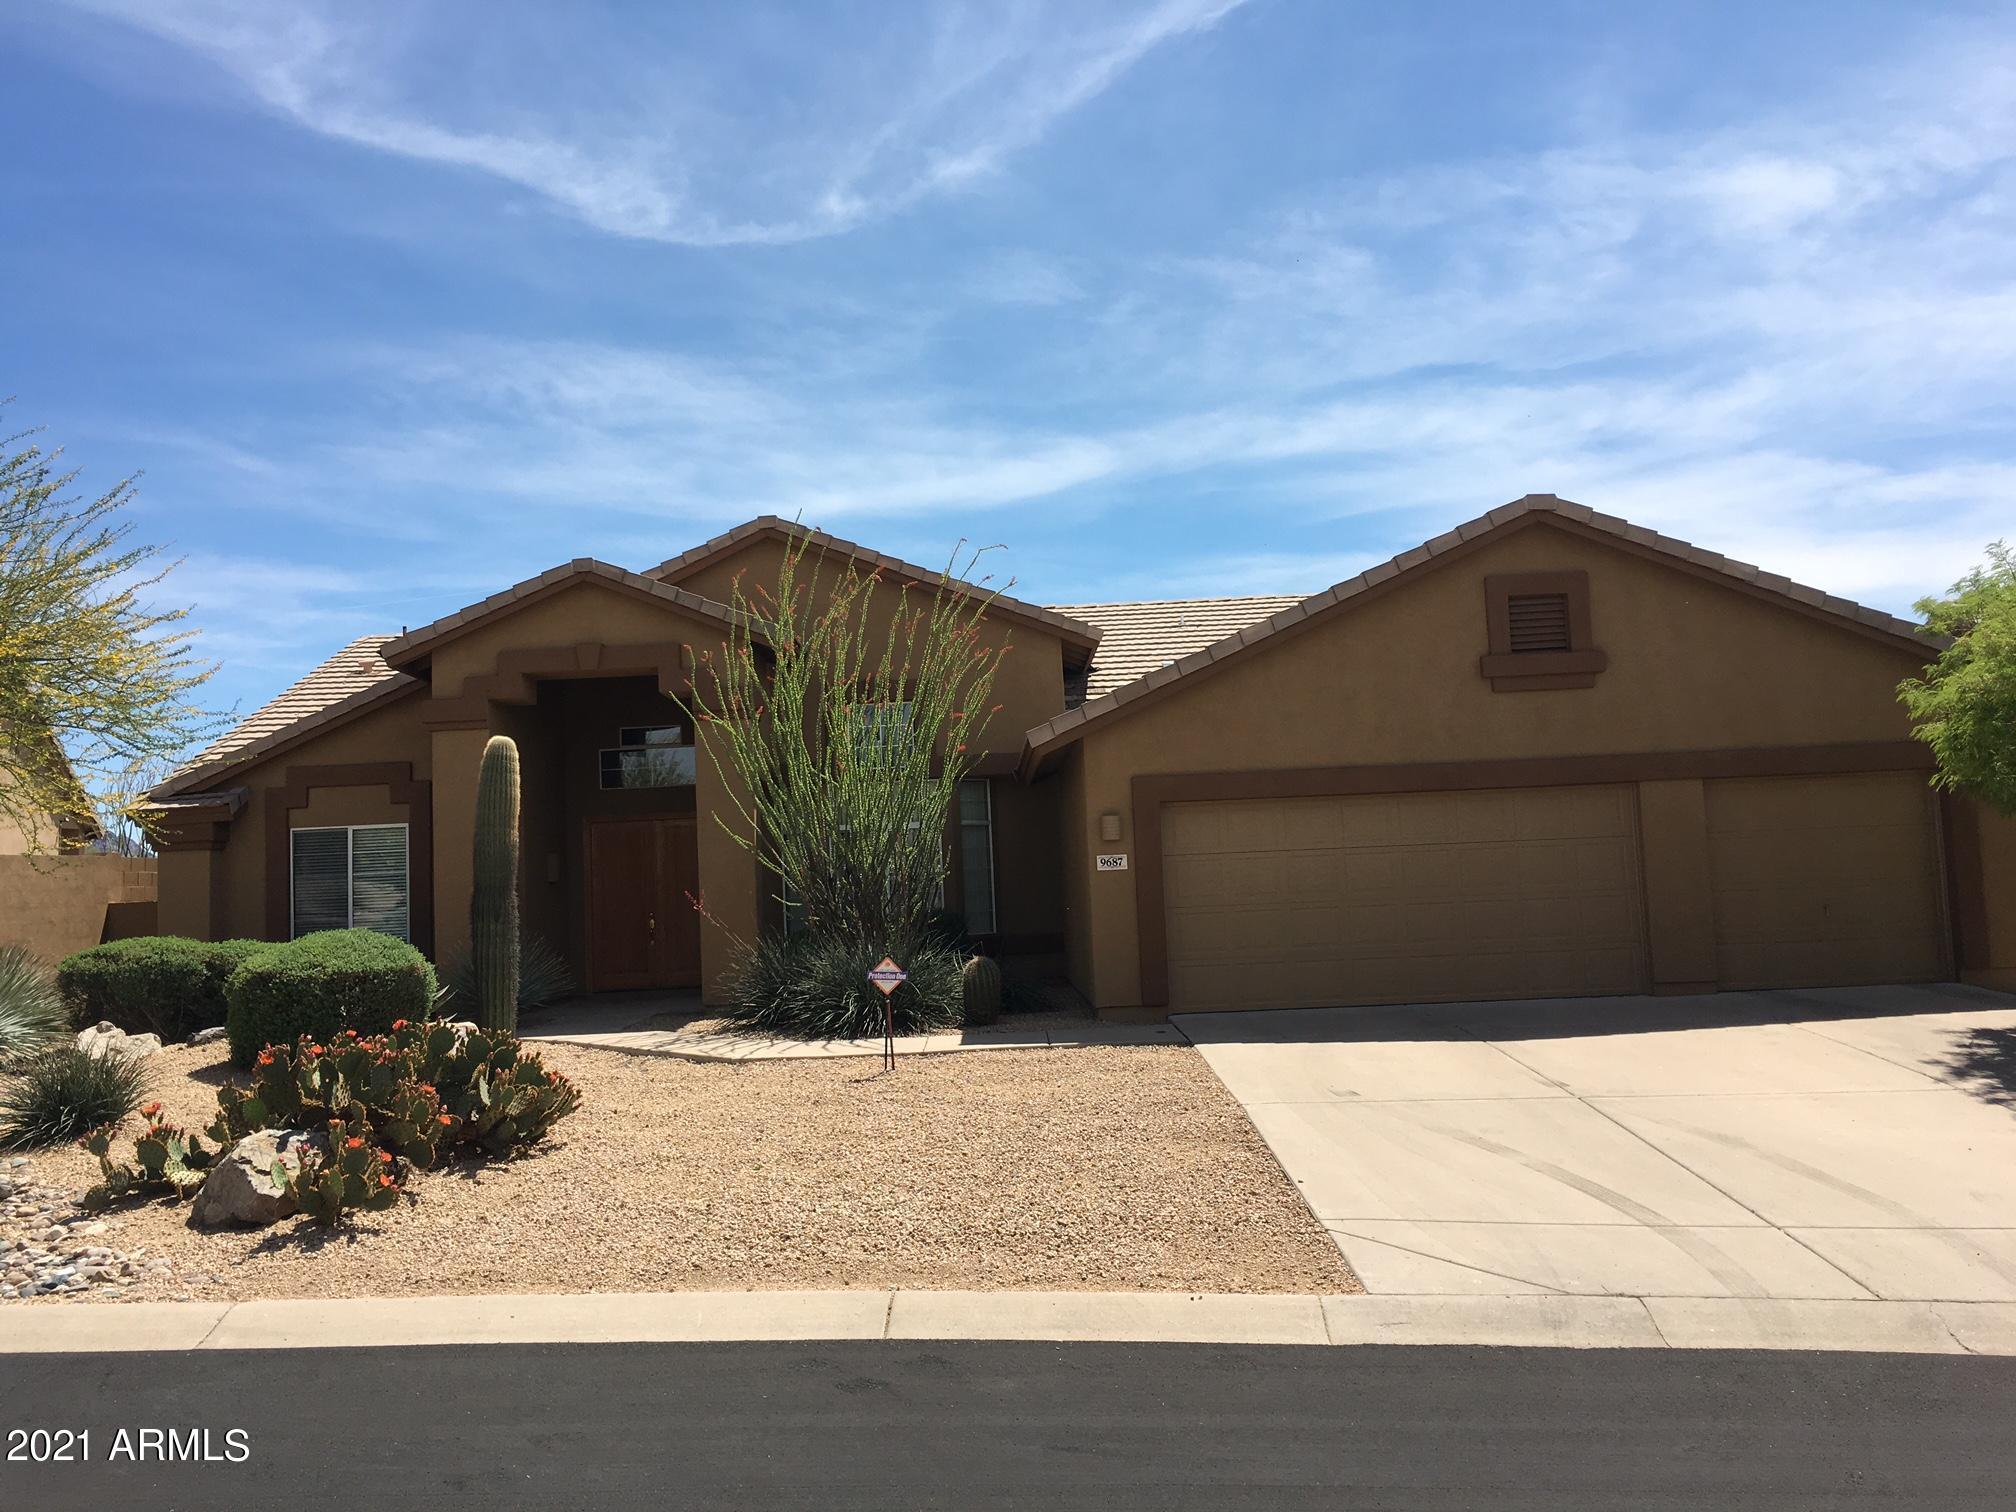 9687 E BALANCING ROCK Road, Scottsdale, AZ 85262, 3 Bedrooms Bedrooms, ,Residential Lease,For Rent,9687 E BALANCING ROCK Road,6196542